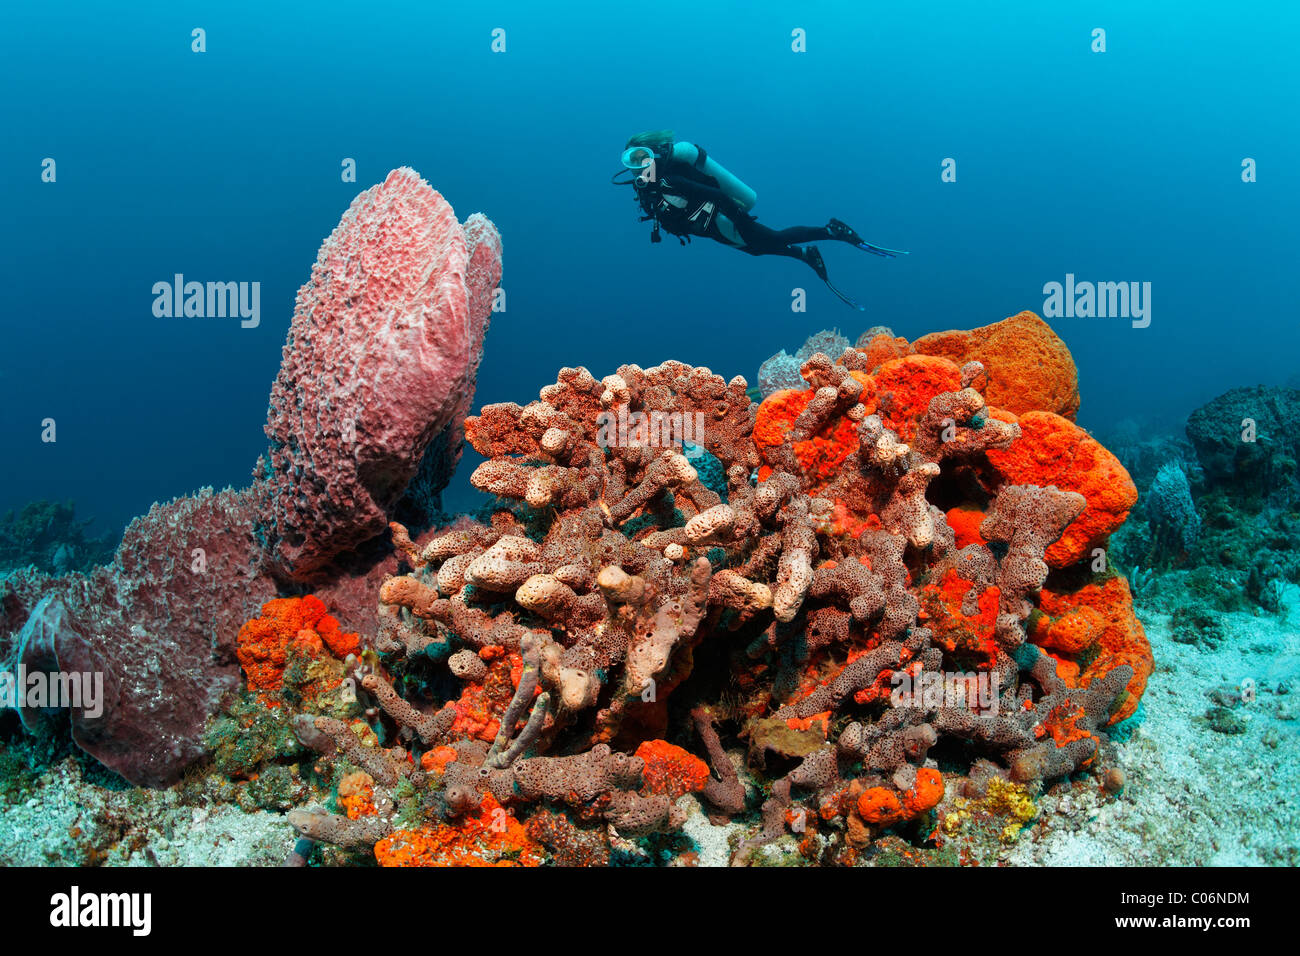 Diver, various multicoloured sponges, sandy ground, Little Tobago, Speyside, Trinidad and Tobago, Lesser Antilles, - Stock Image